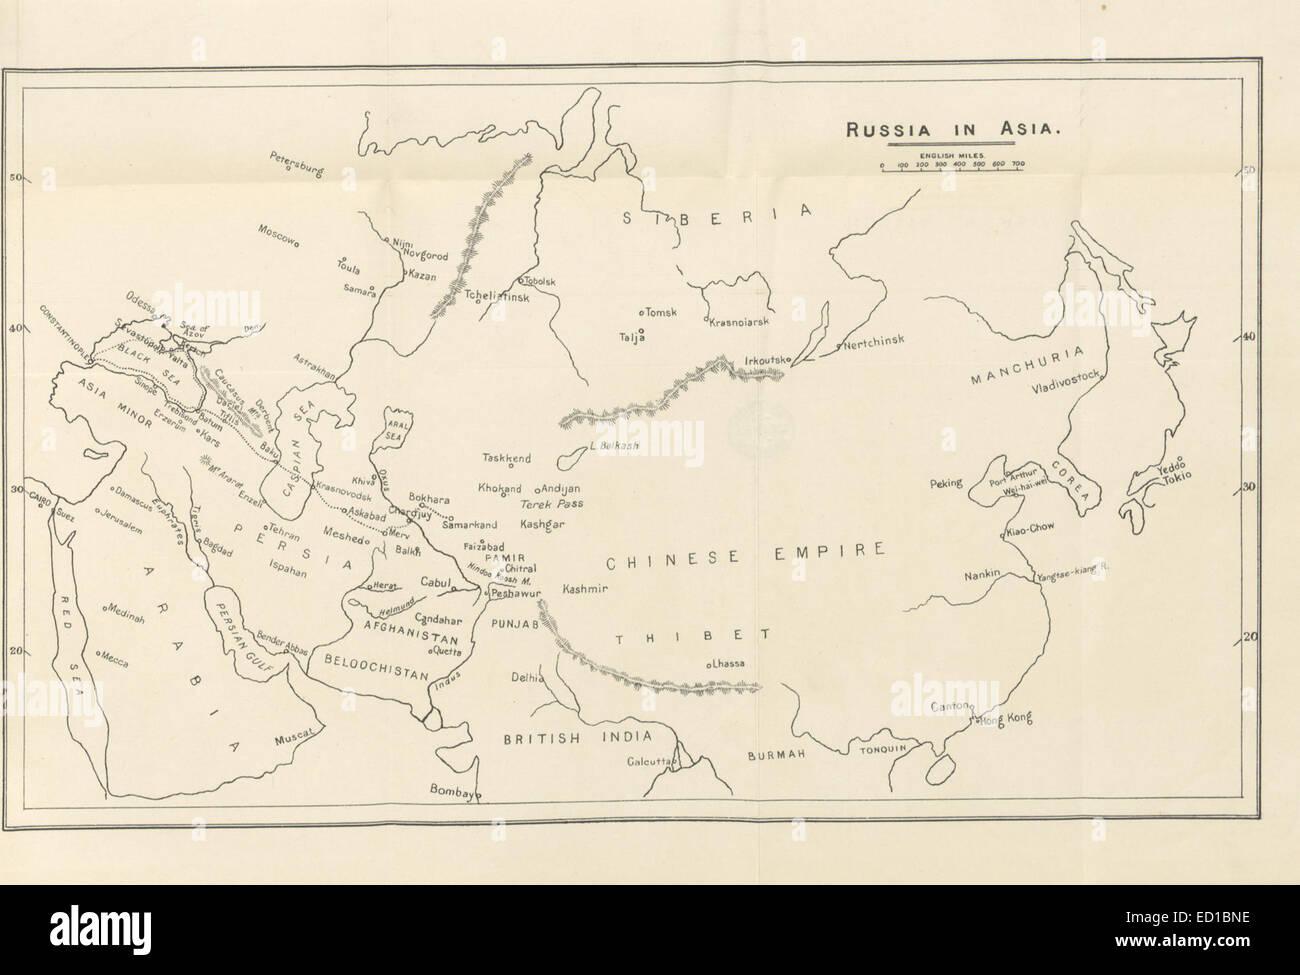 Karte Russland Asien.Pg253 Karte Russland In Asien Stockfoto Bild 76863178 Alamy